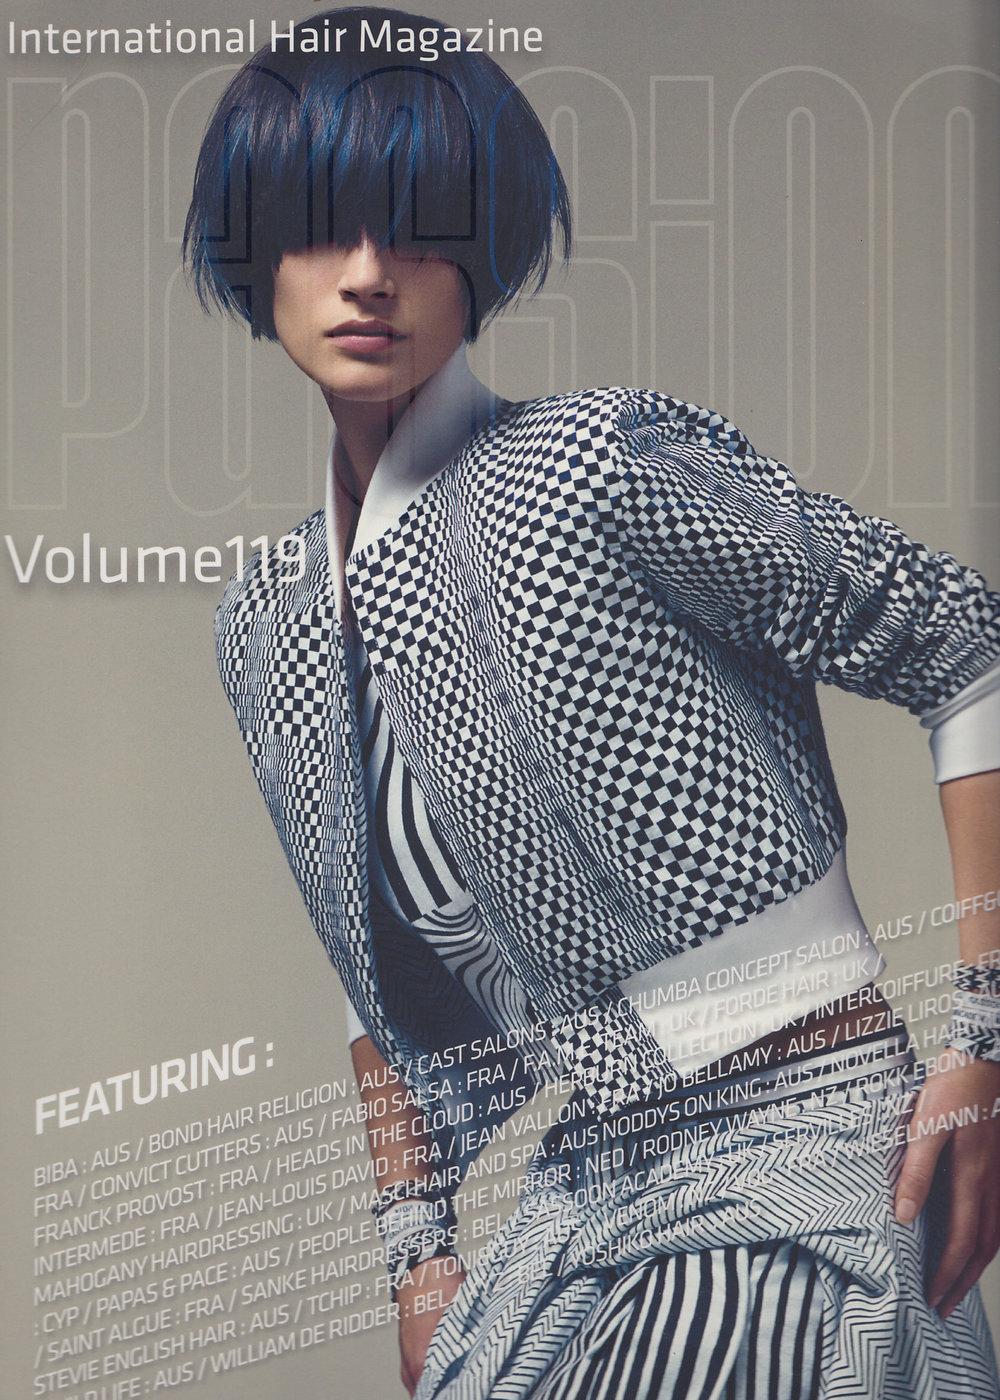 yoshikohair_stkilda_melbourne_hairdresser_hairsalon_passion119_cover